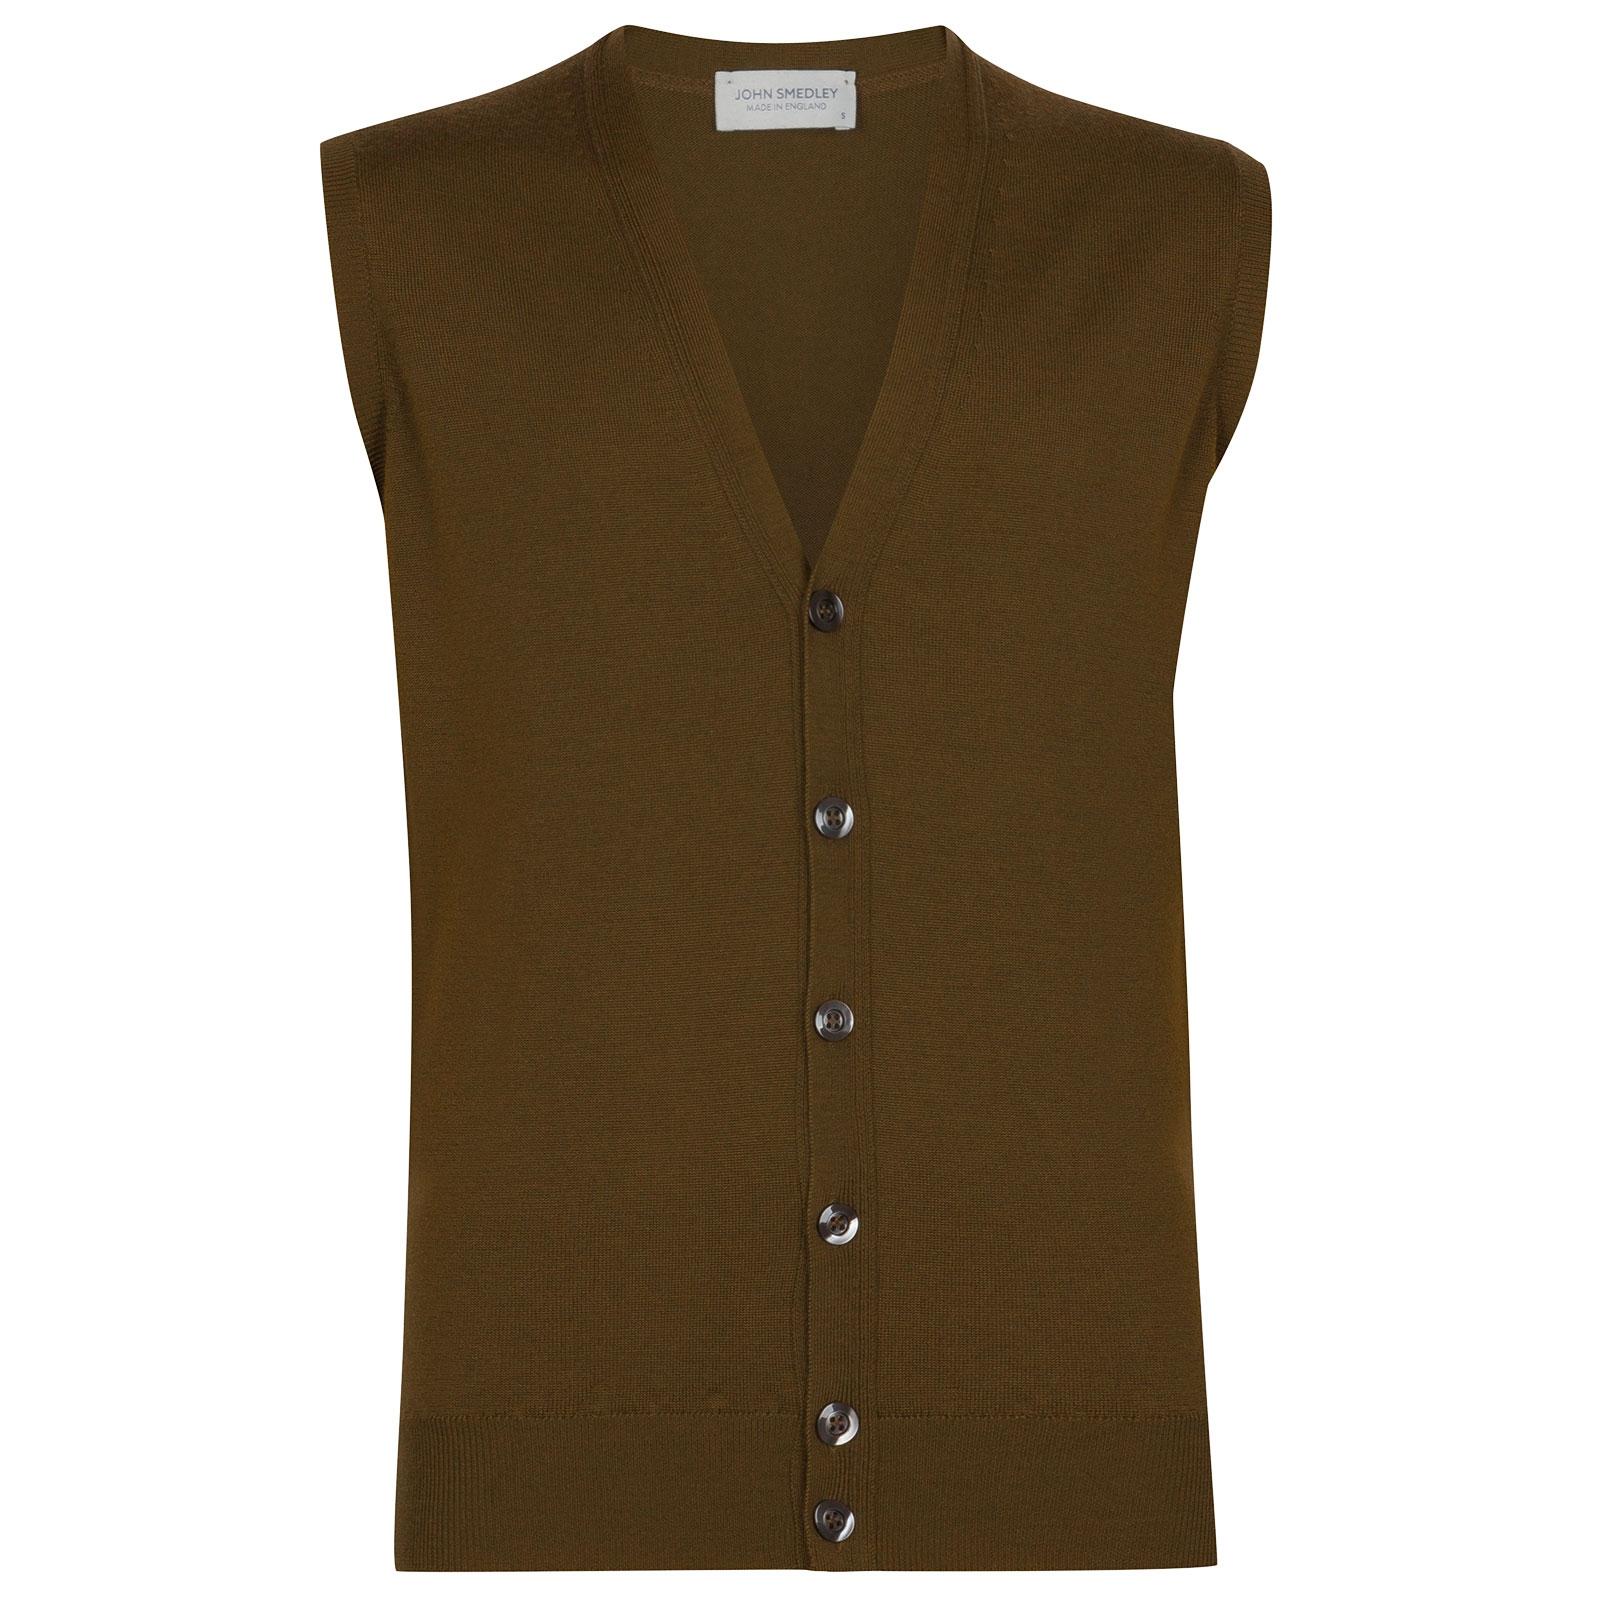 John Smedley Stavely Merino Wool Waistcoat in Khaki-XXL